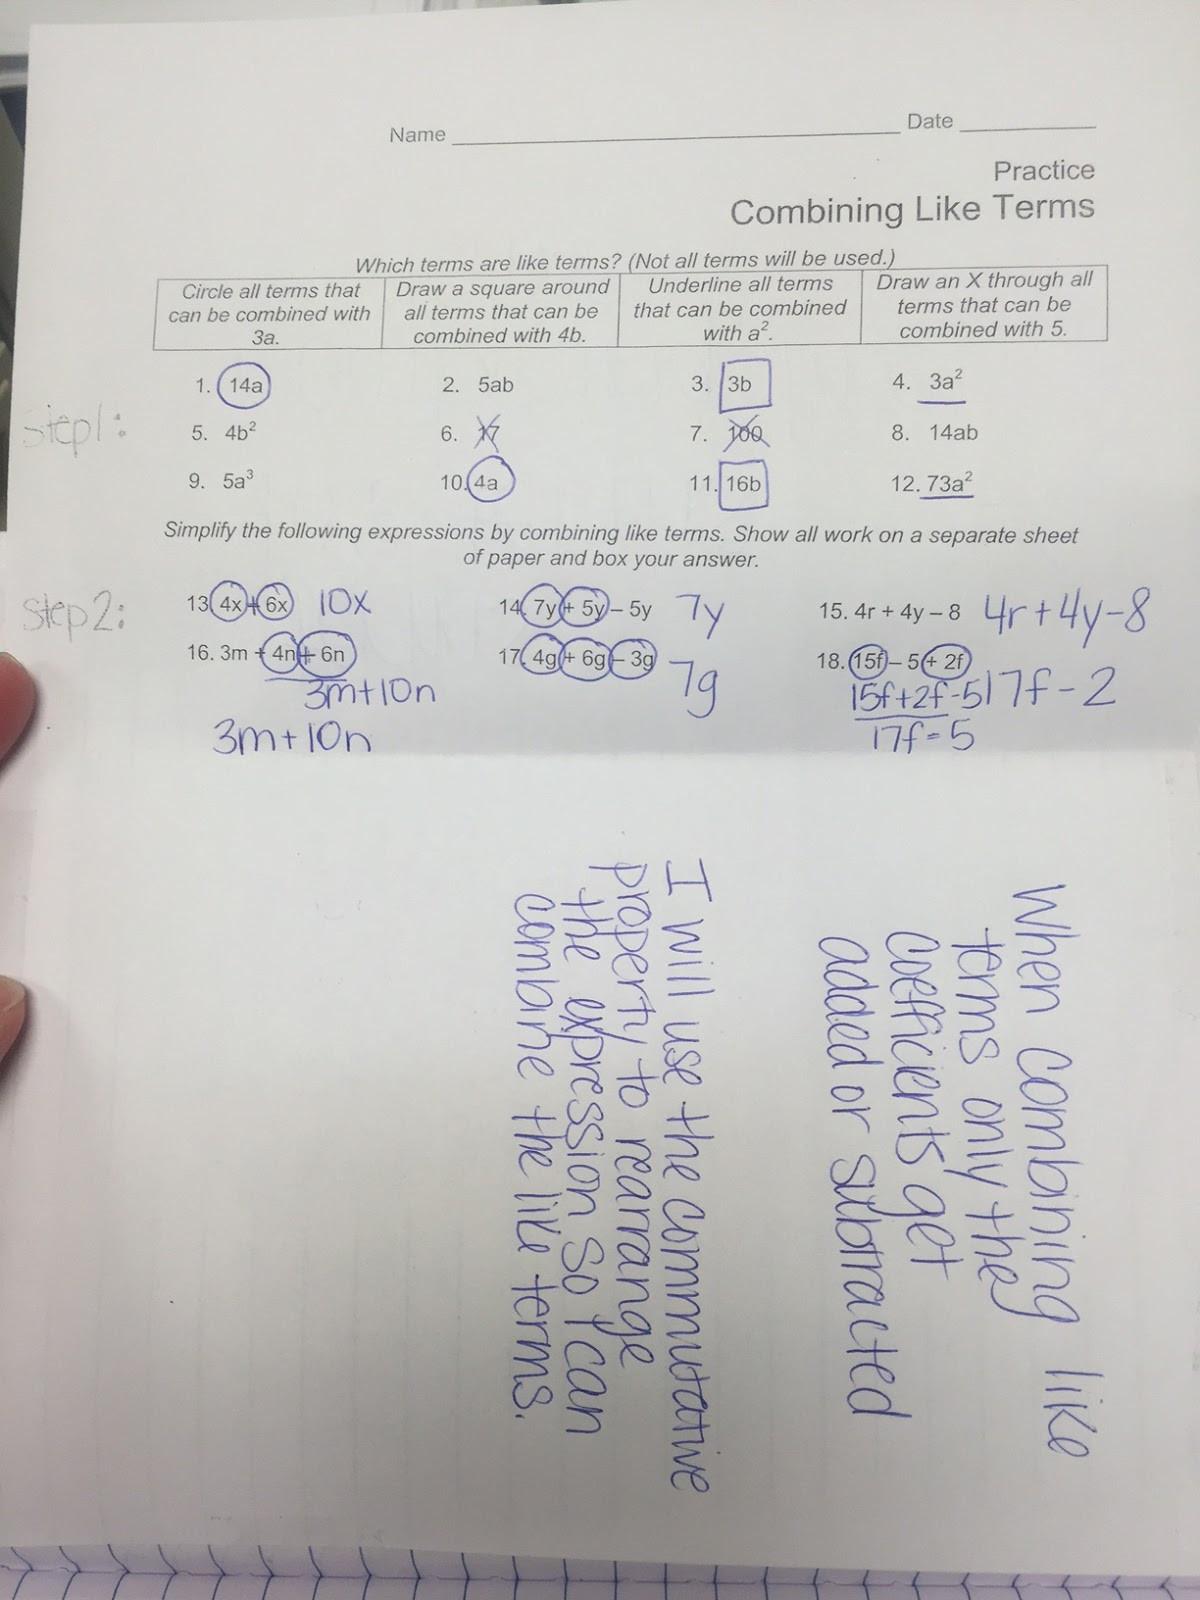 Combining Like Terms Practice Worksheet 33 Bining Like Terms Practice Worksheet Answers